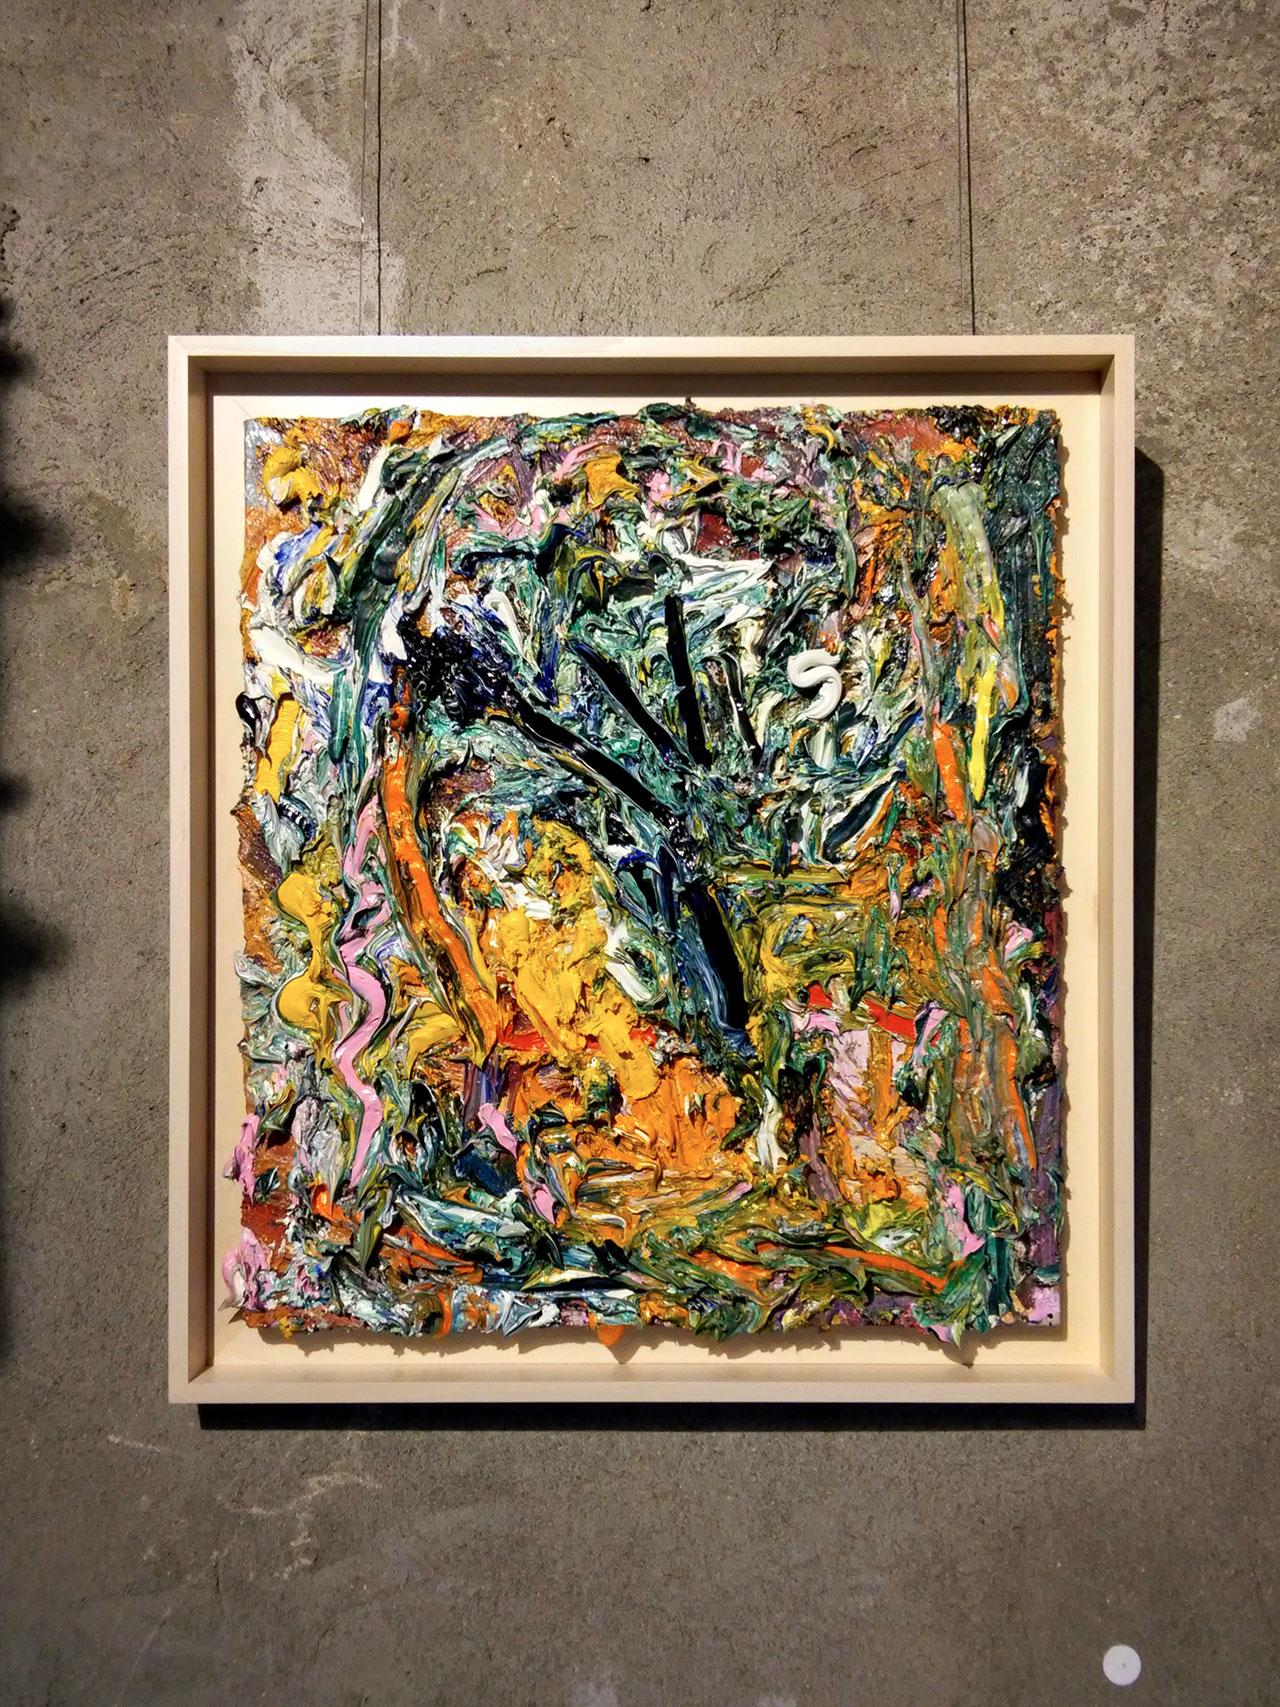 "Ying Li, ""The Last Tree"" (2015), oil on canvas, 20 x 16 in"